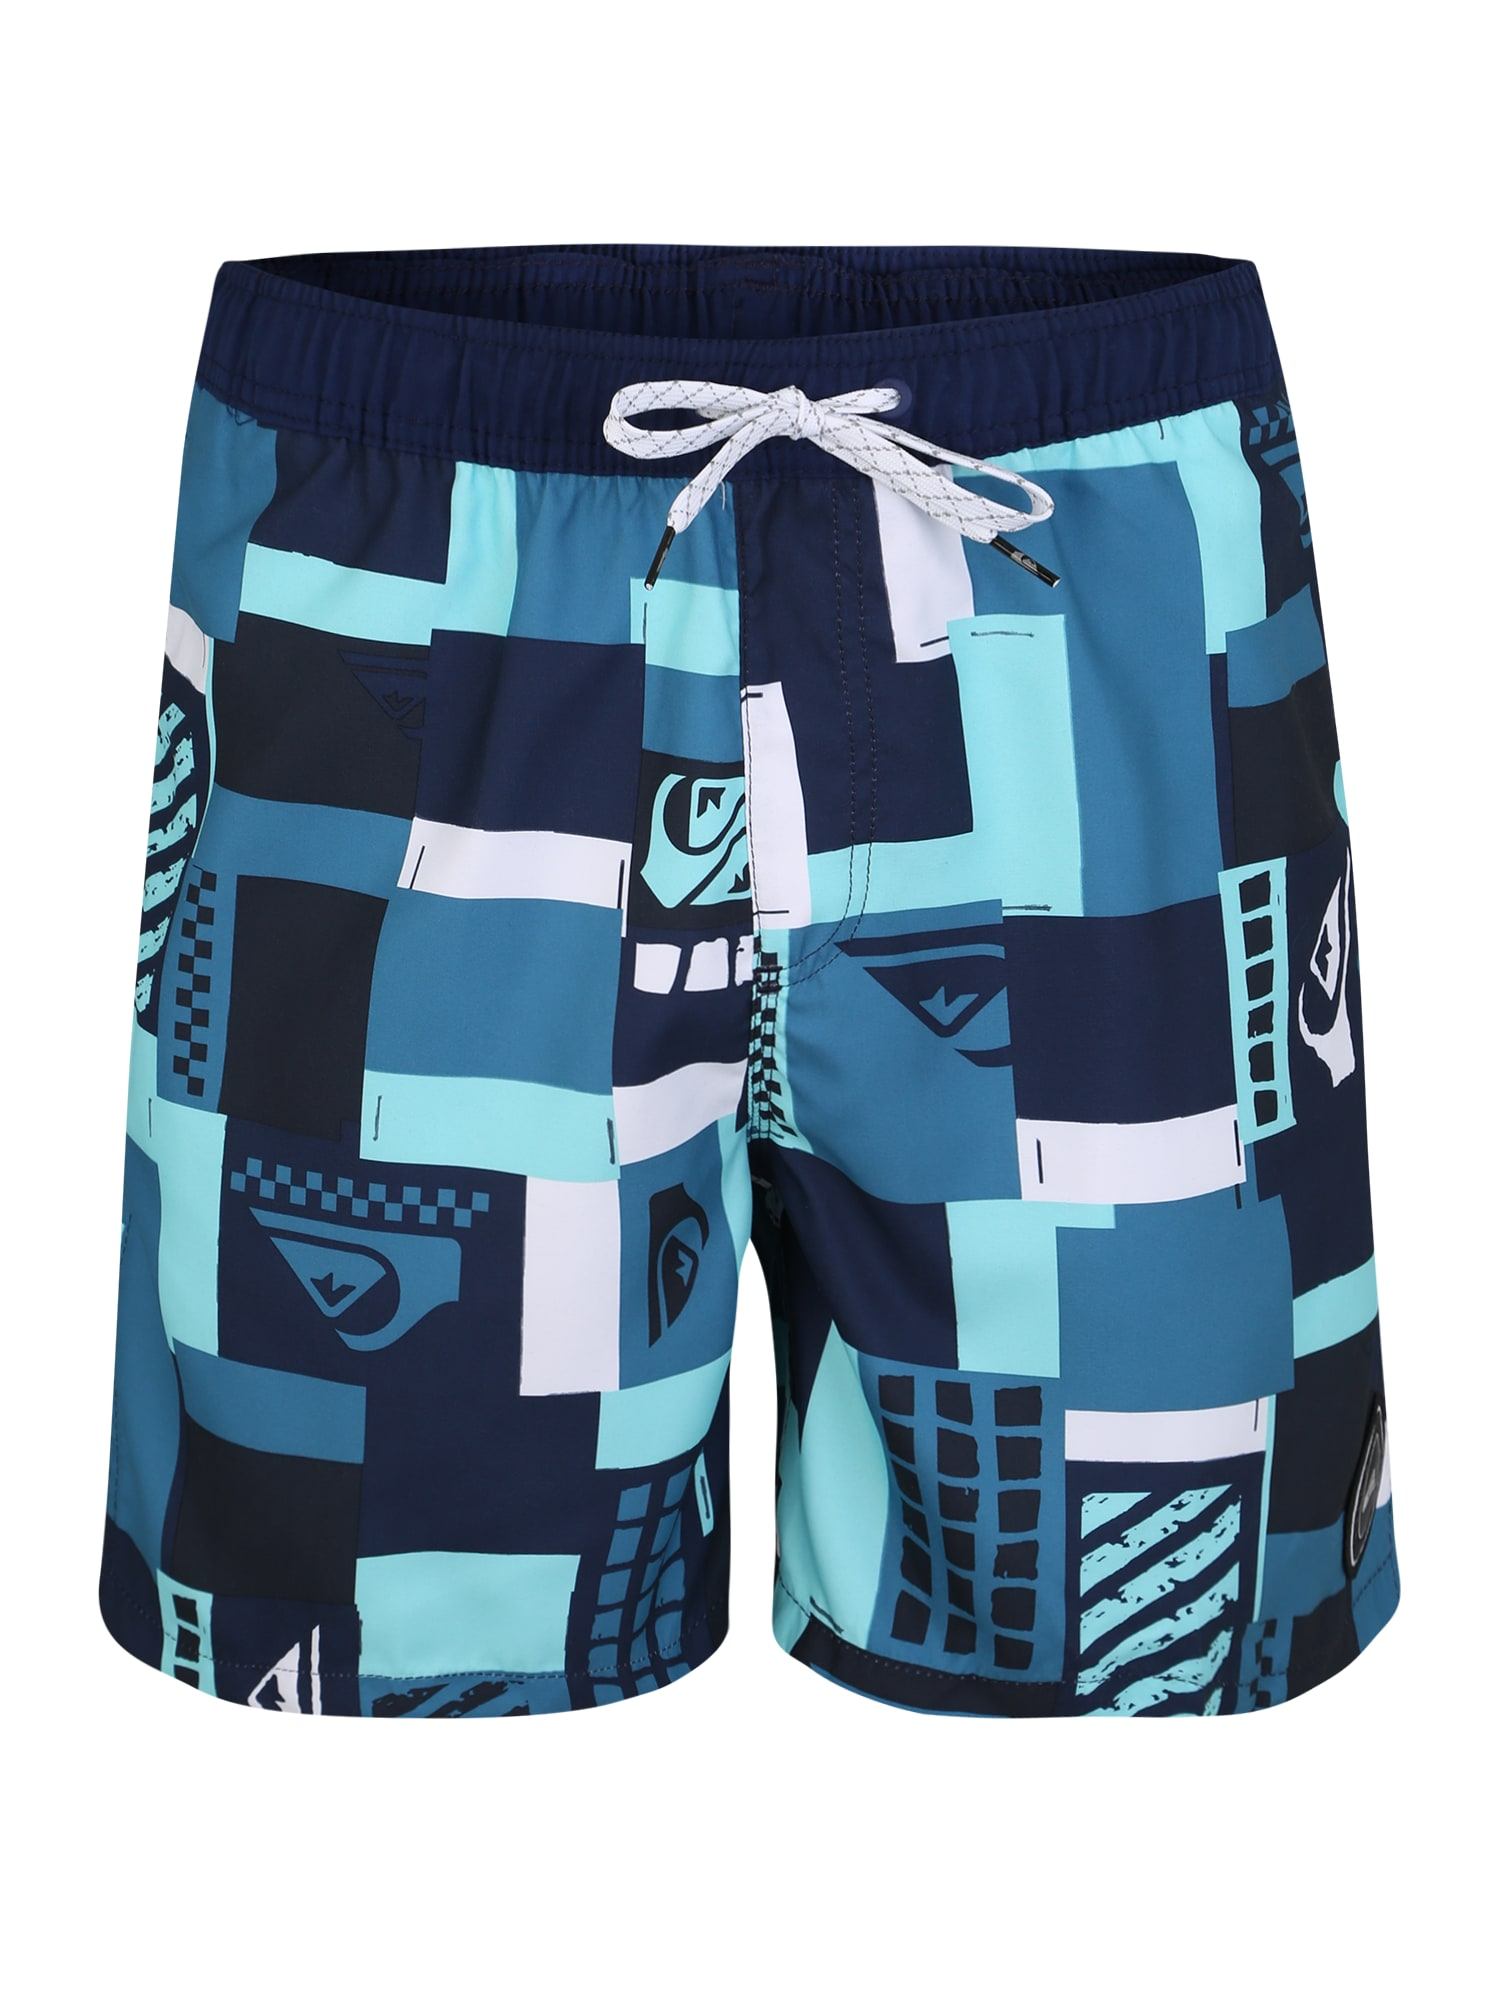 Plavecké šortky CITY BLOCK VOLLEY 17 modrá mix barev QUIKSILVER